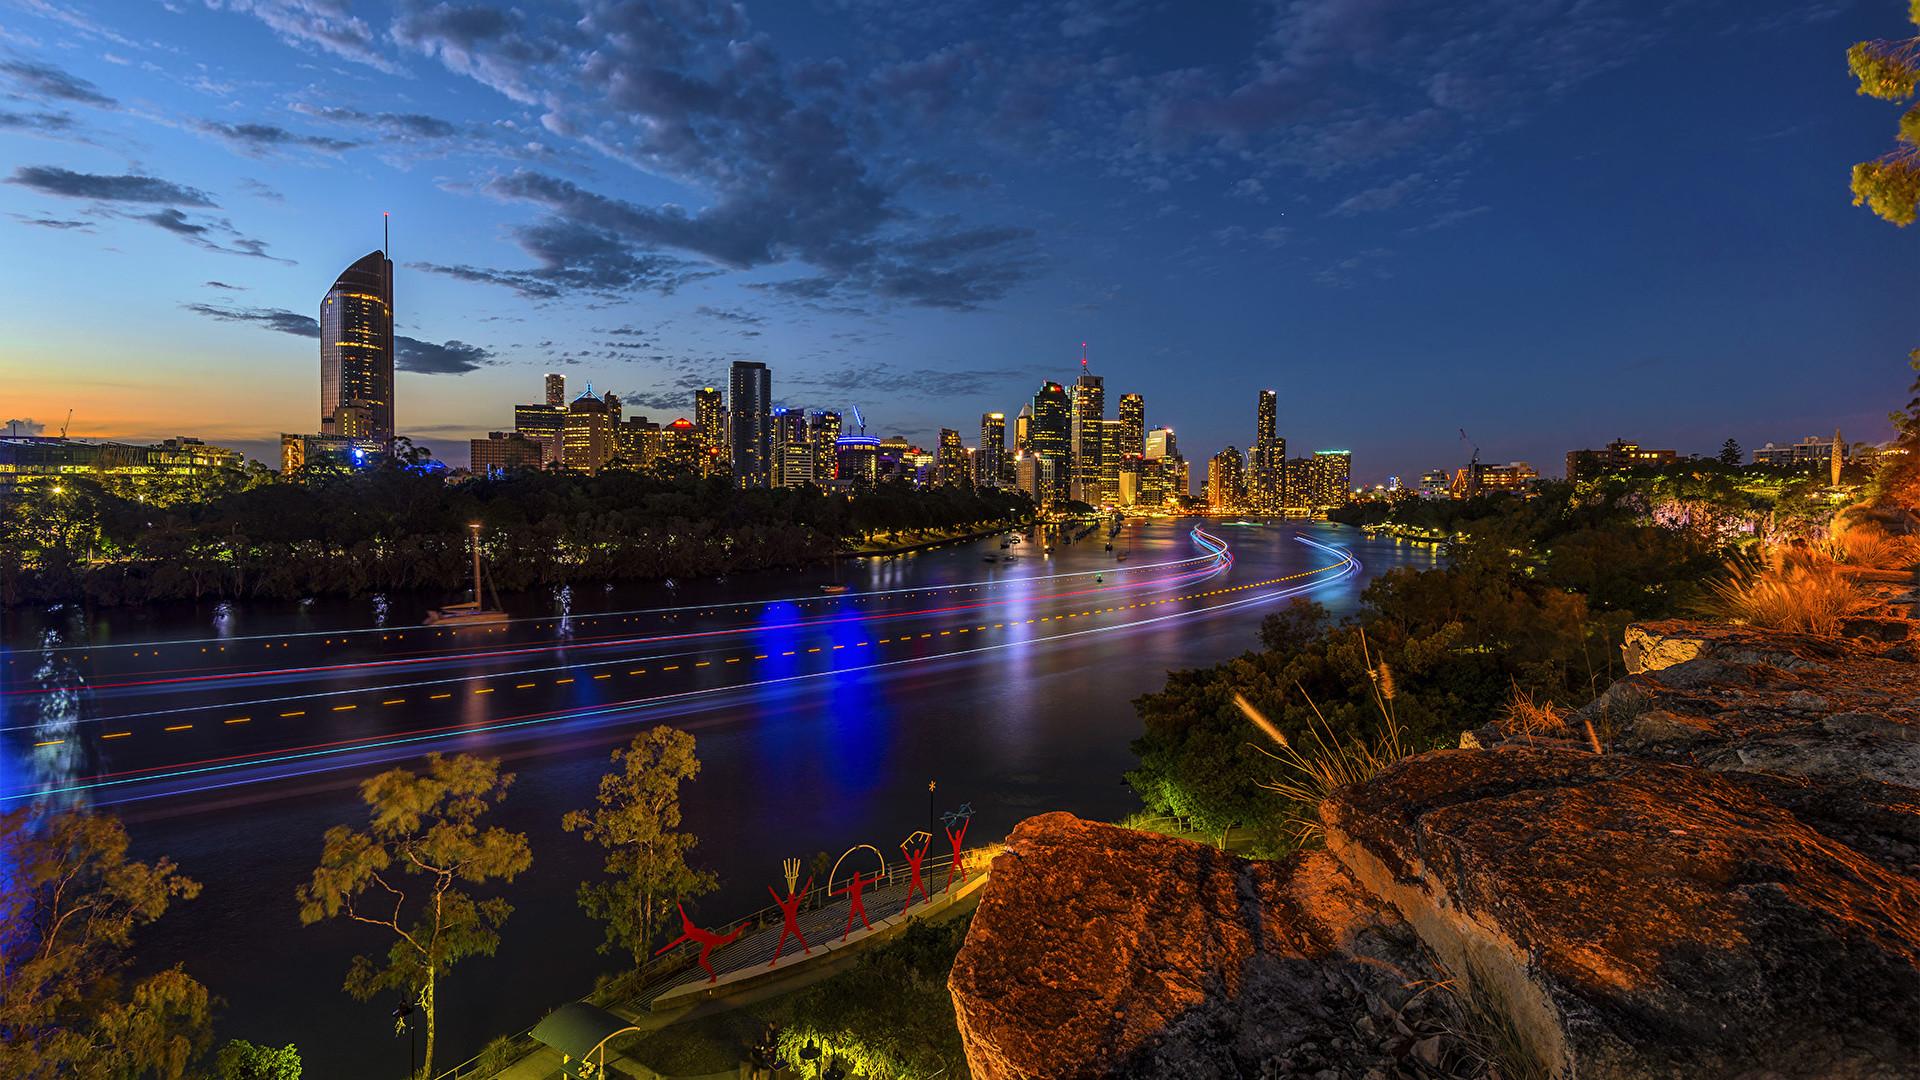 Wallpaper Brisbane Australia Sky Roads Stones night time Cities Building  Night Houses